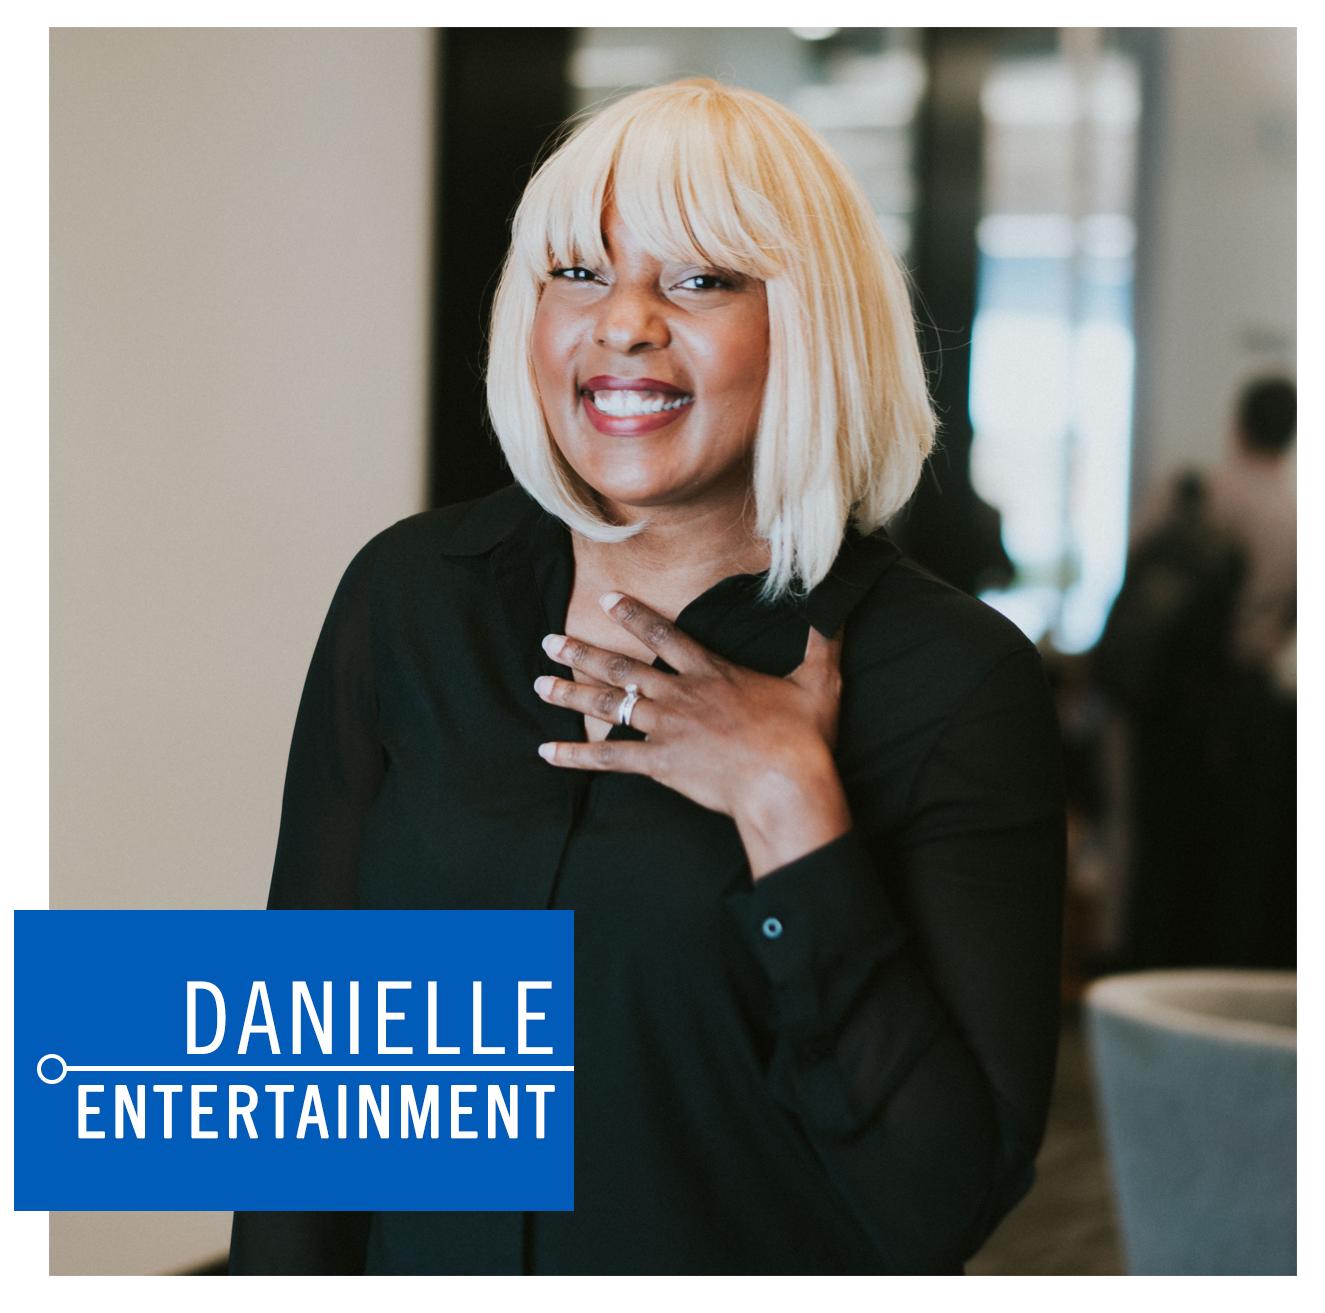 Danielle Entertainment advisor.png